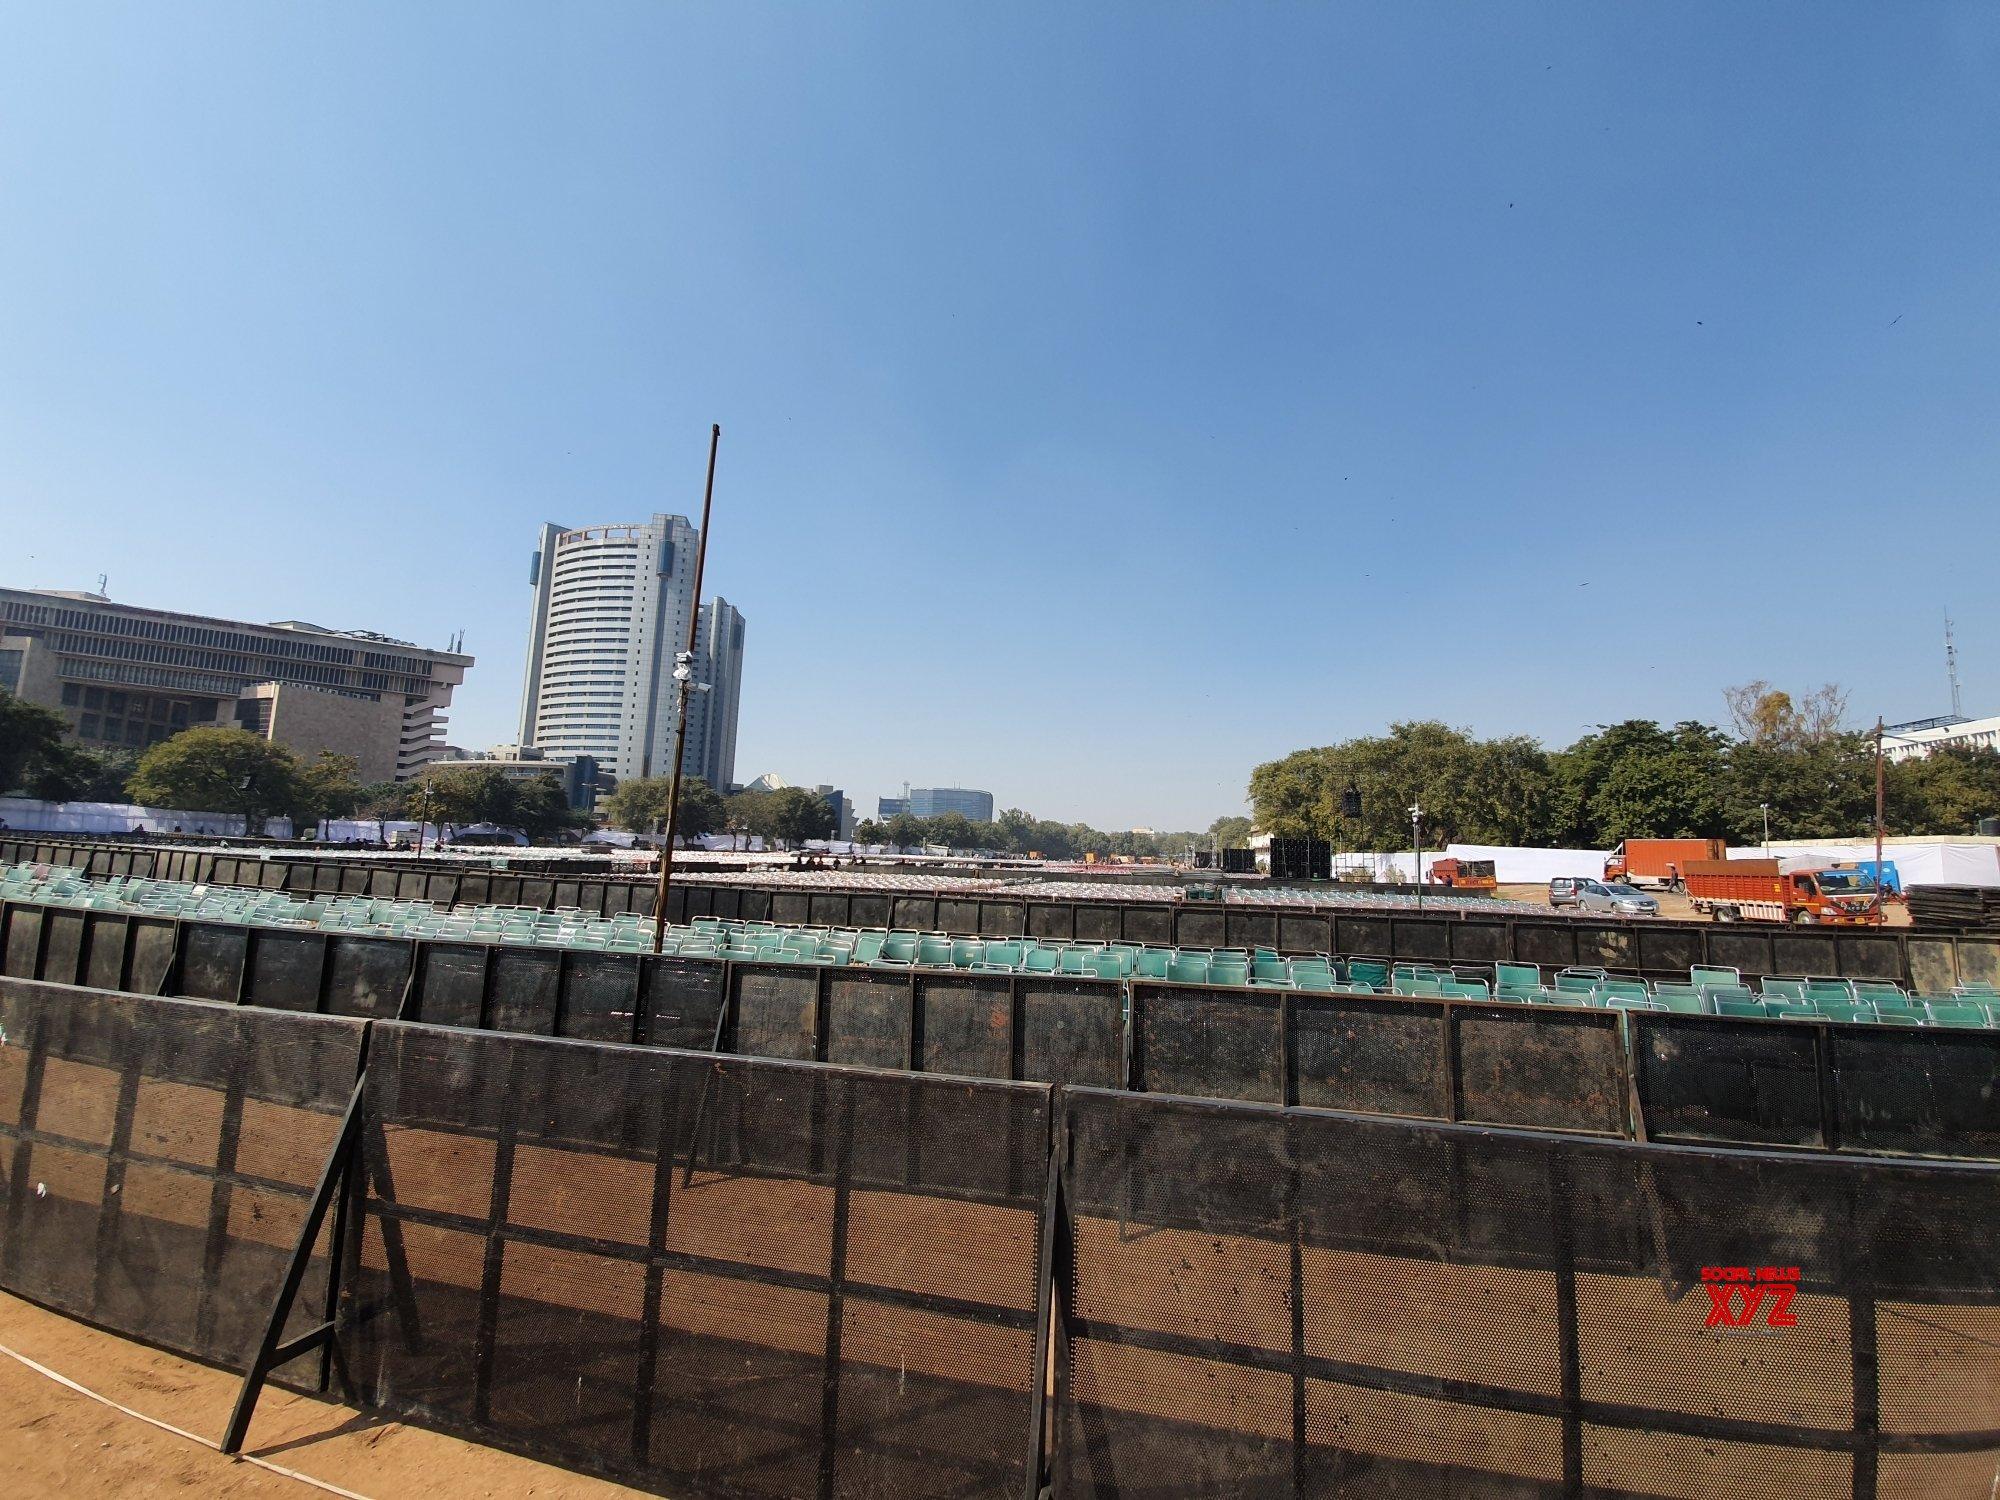 New Delhi: Preparations for Kejriwal's wearing - in ceremony underway at Ramlila Ground #Gallery